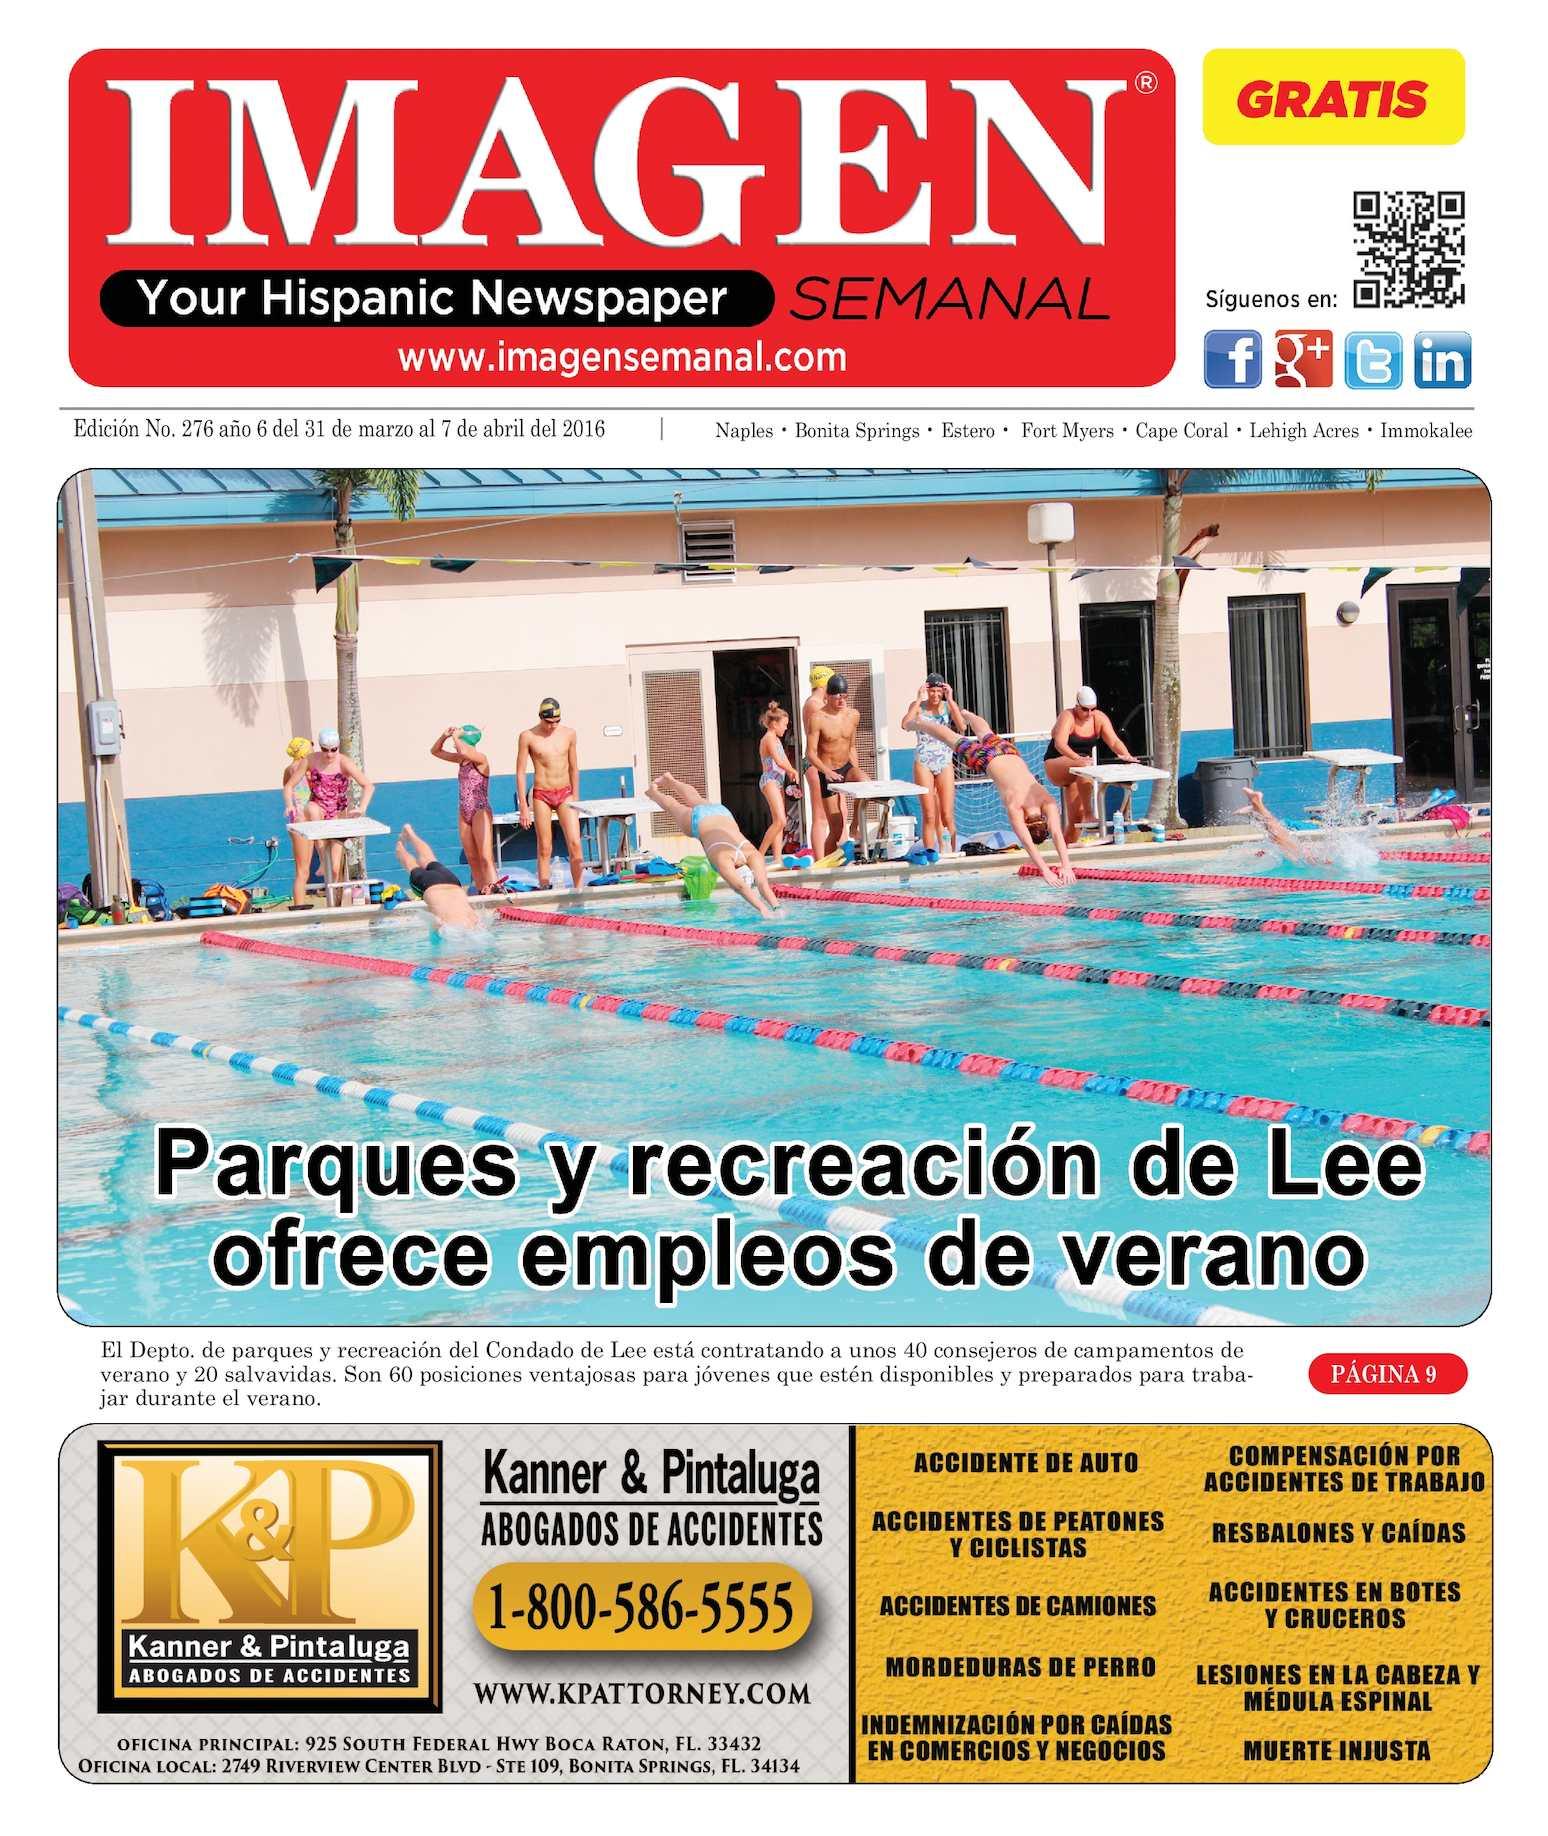 Calaméo - Imagen Newspaper Edicion # 276